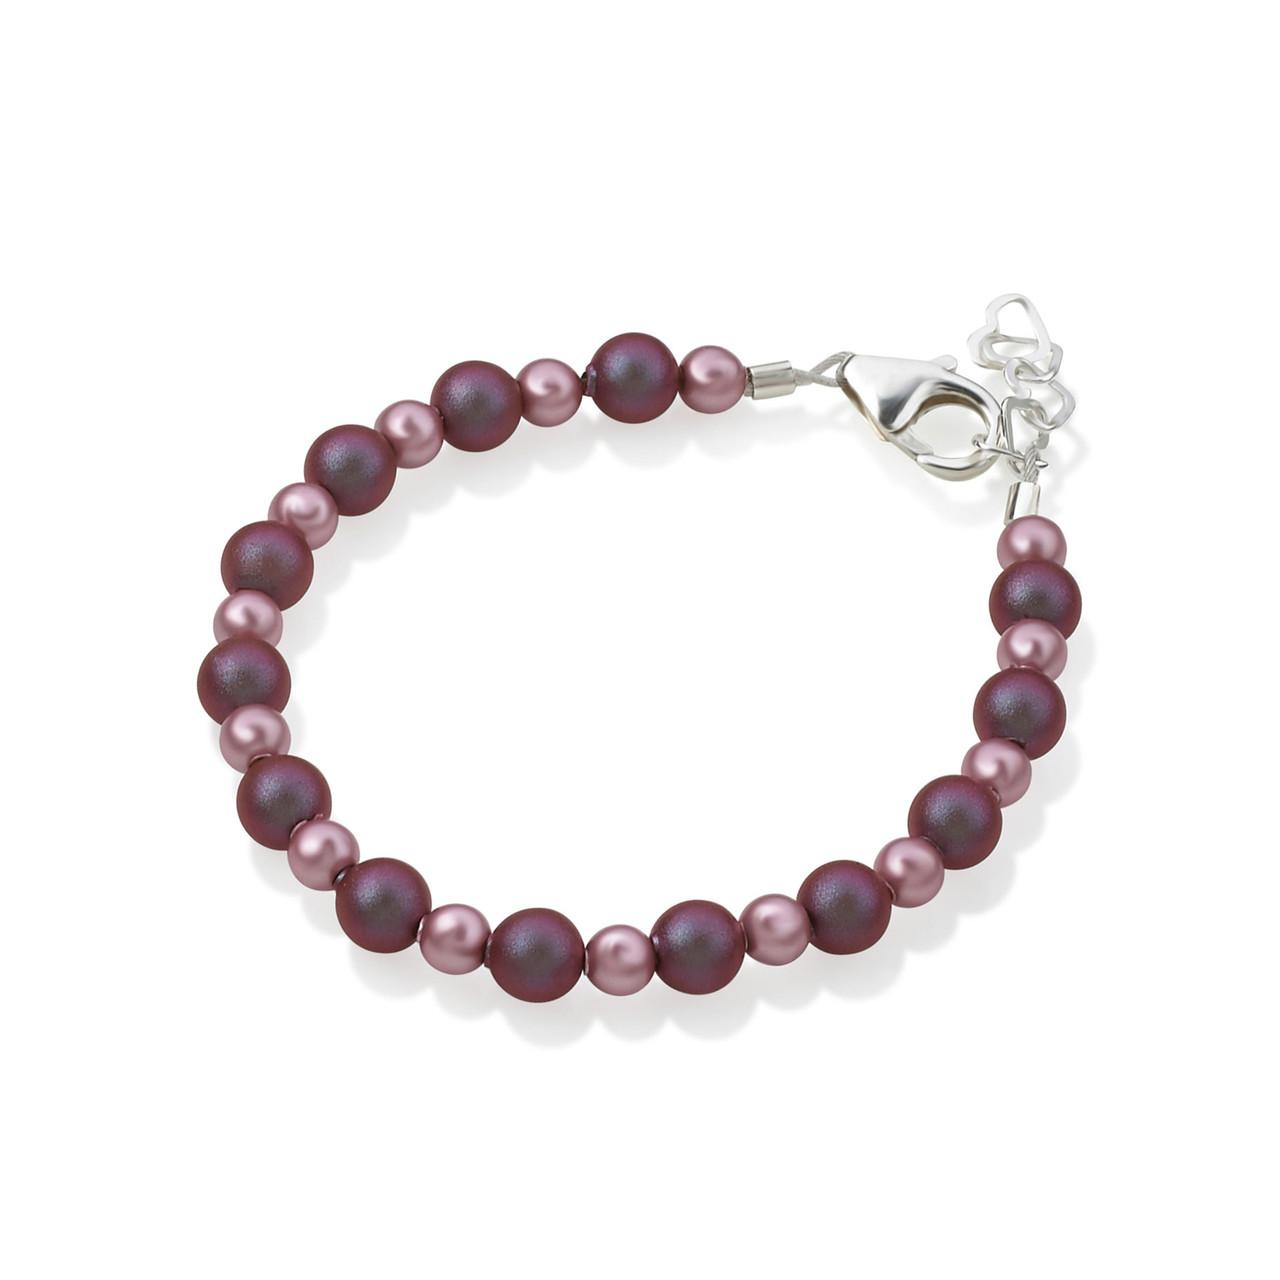 Crystal Dream Baby Bracelet - B1913, S